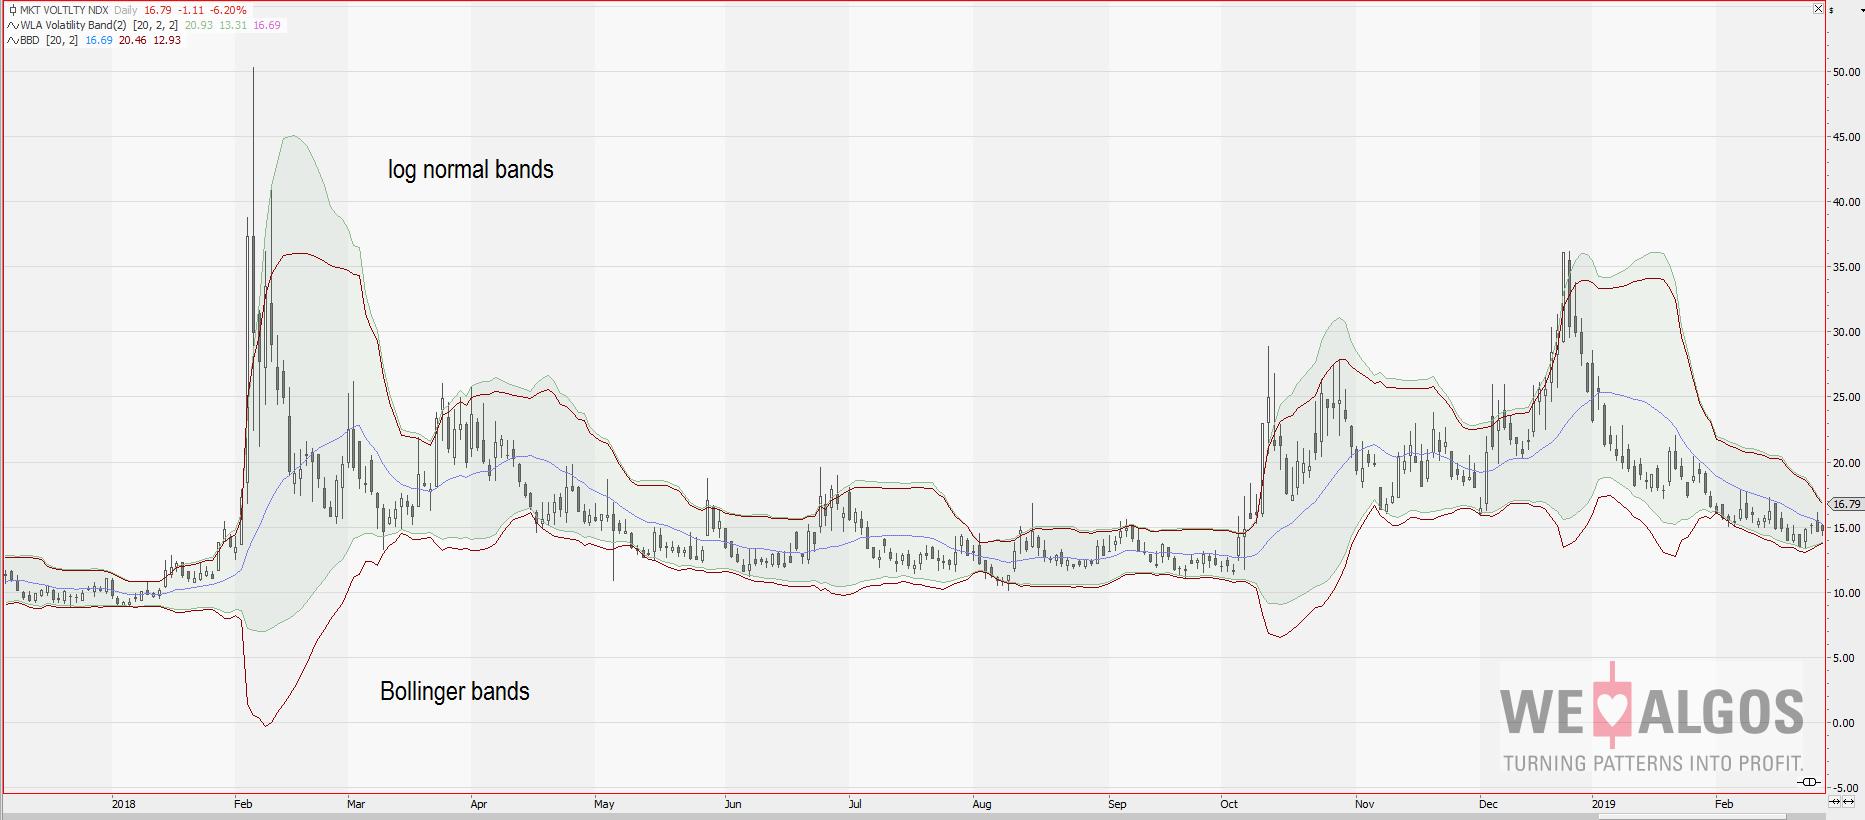 Lognormal Volatility Band